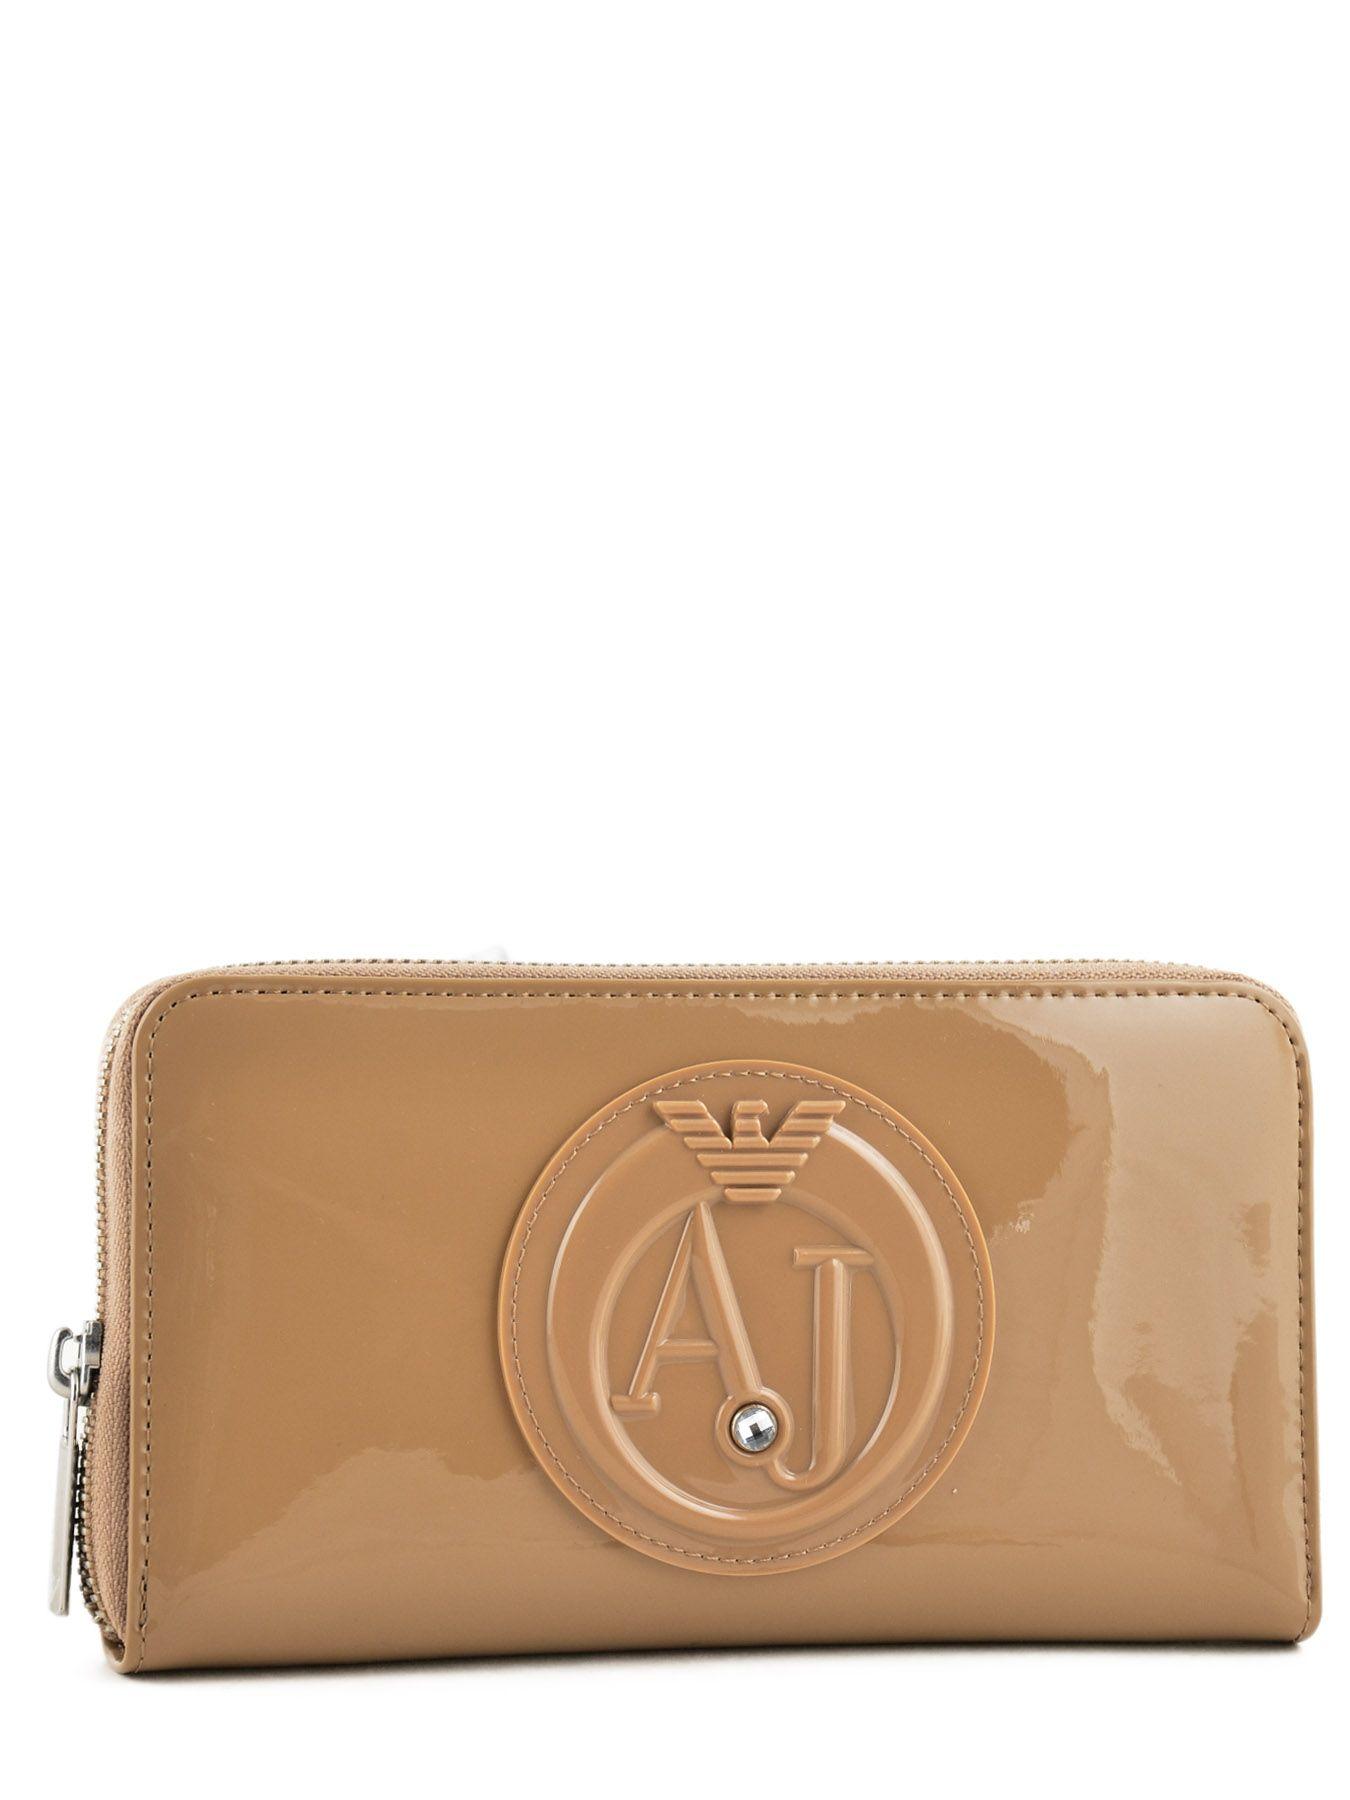 Portefeuille Armani Jeans Vernice lucida 05V32-55 sur edisac.be a4350acd6c9